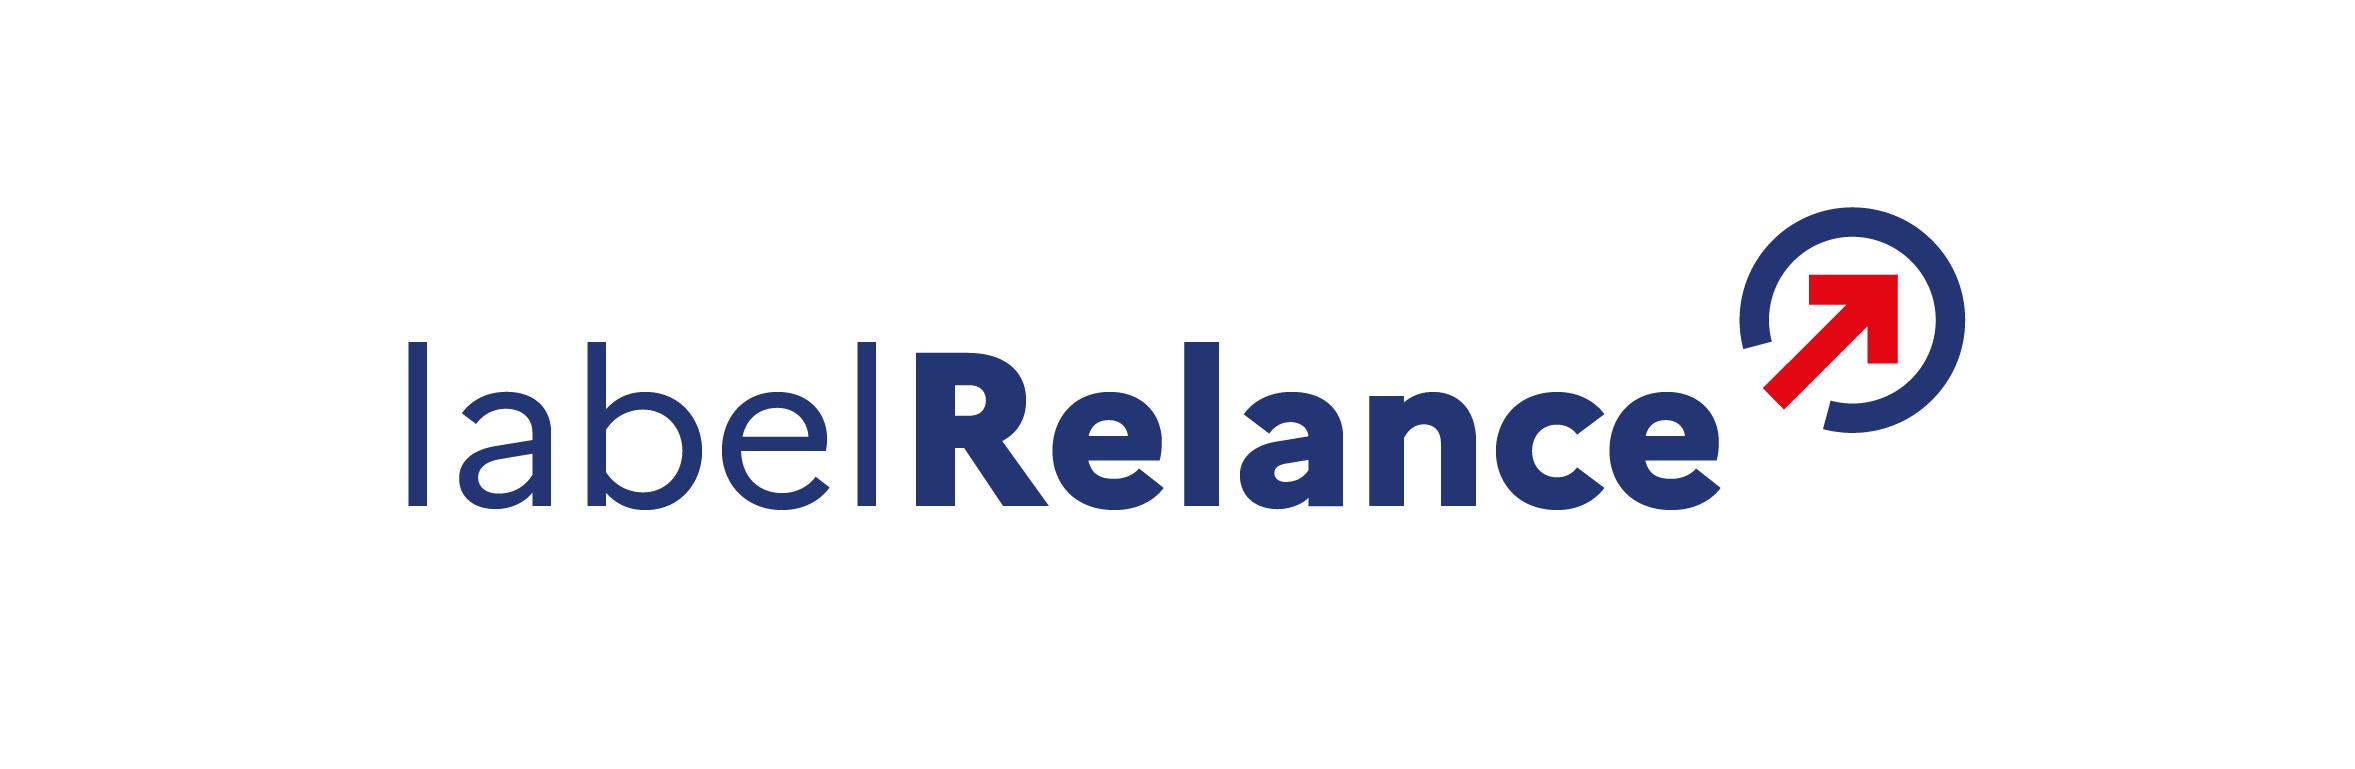 label relance